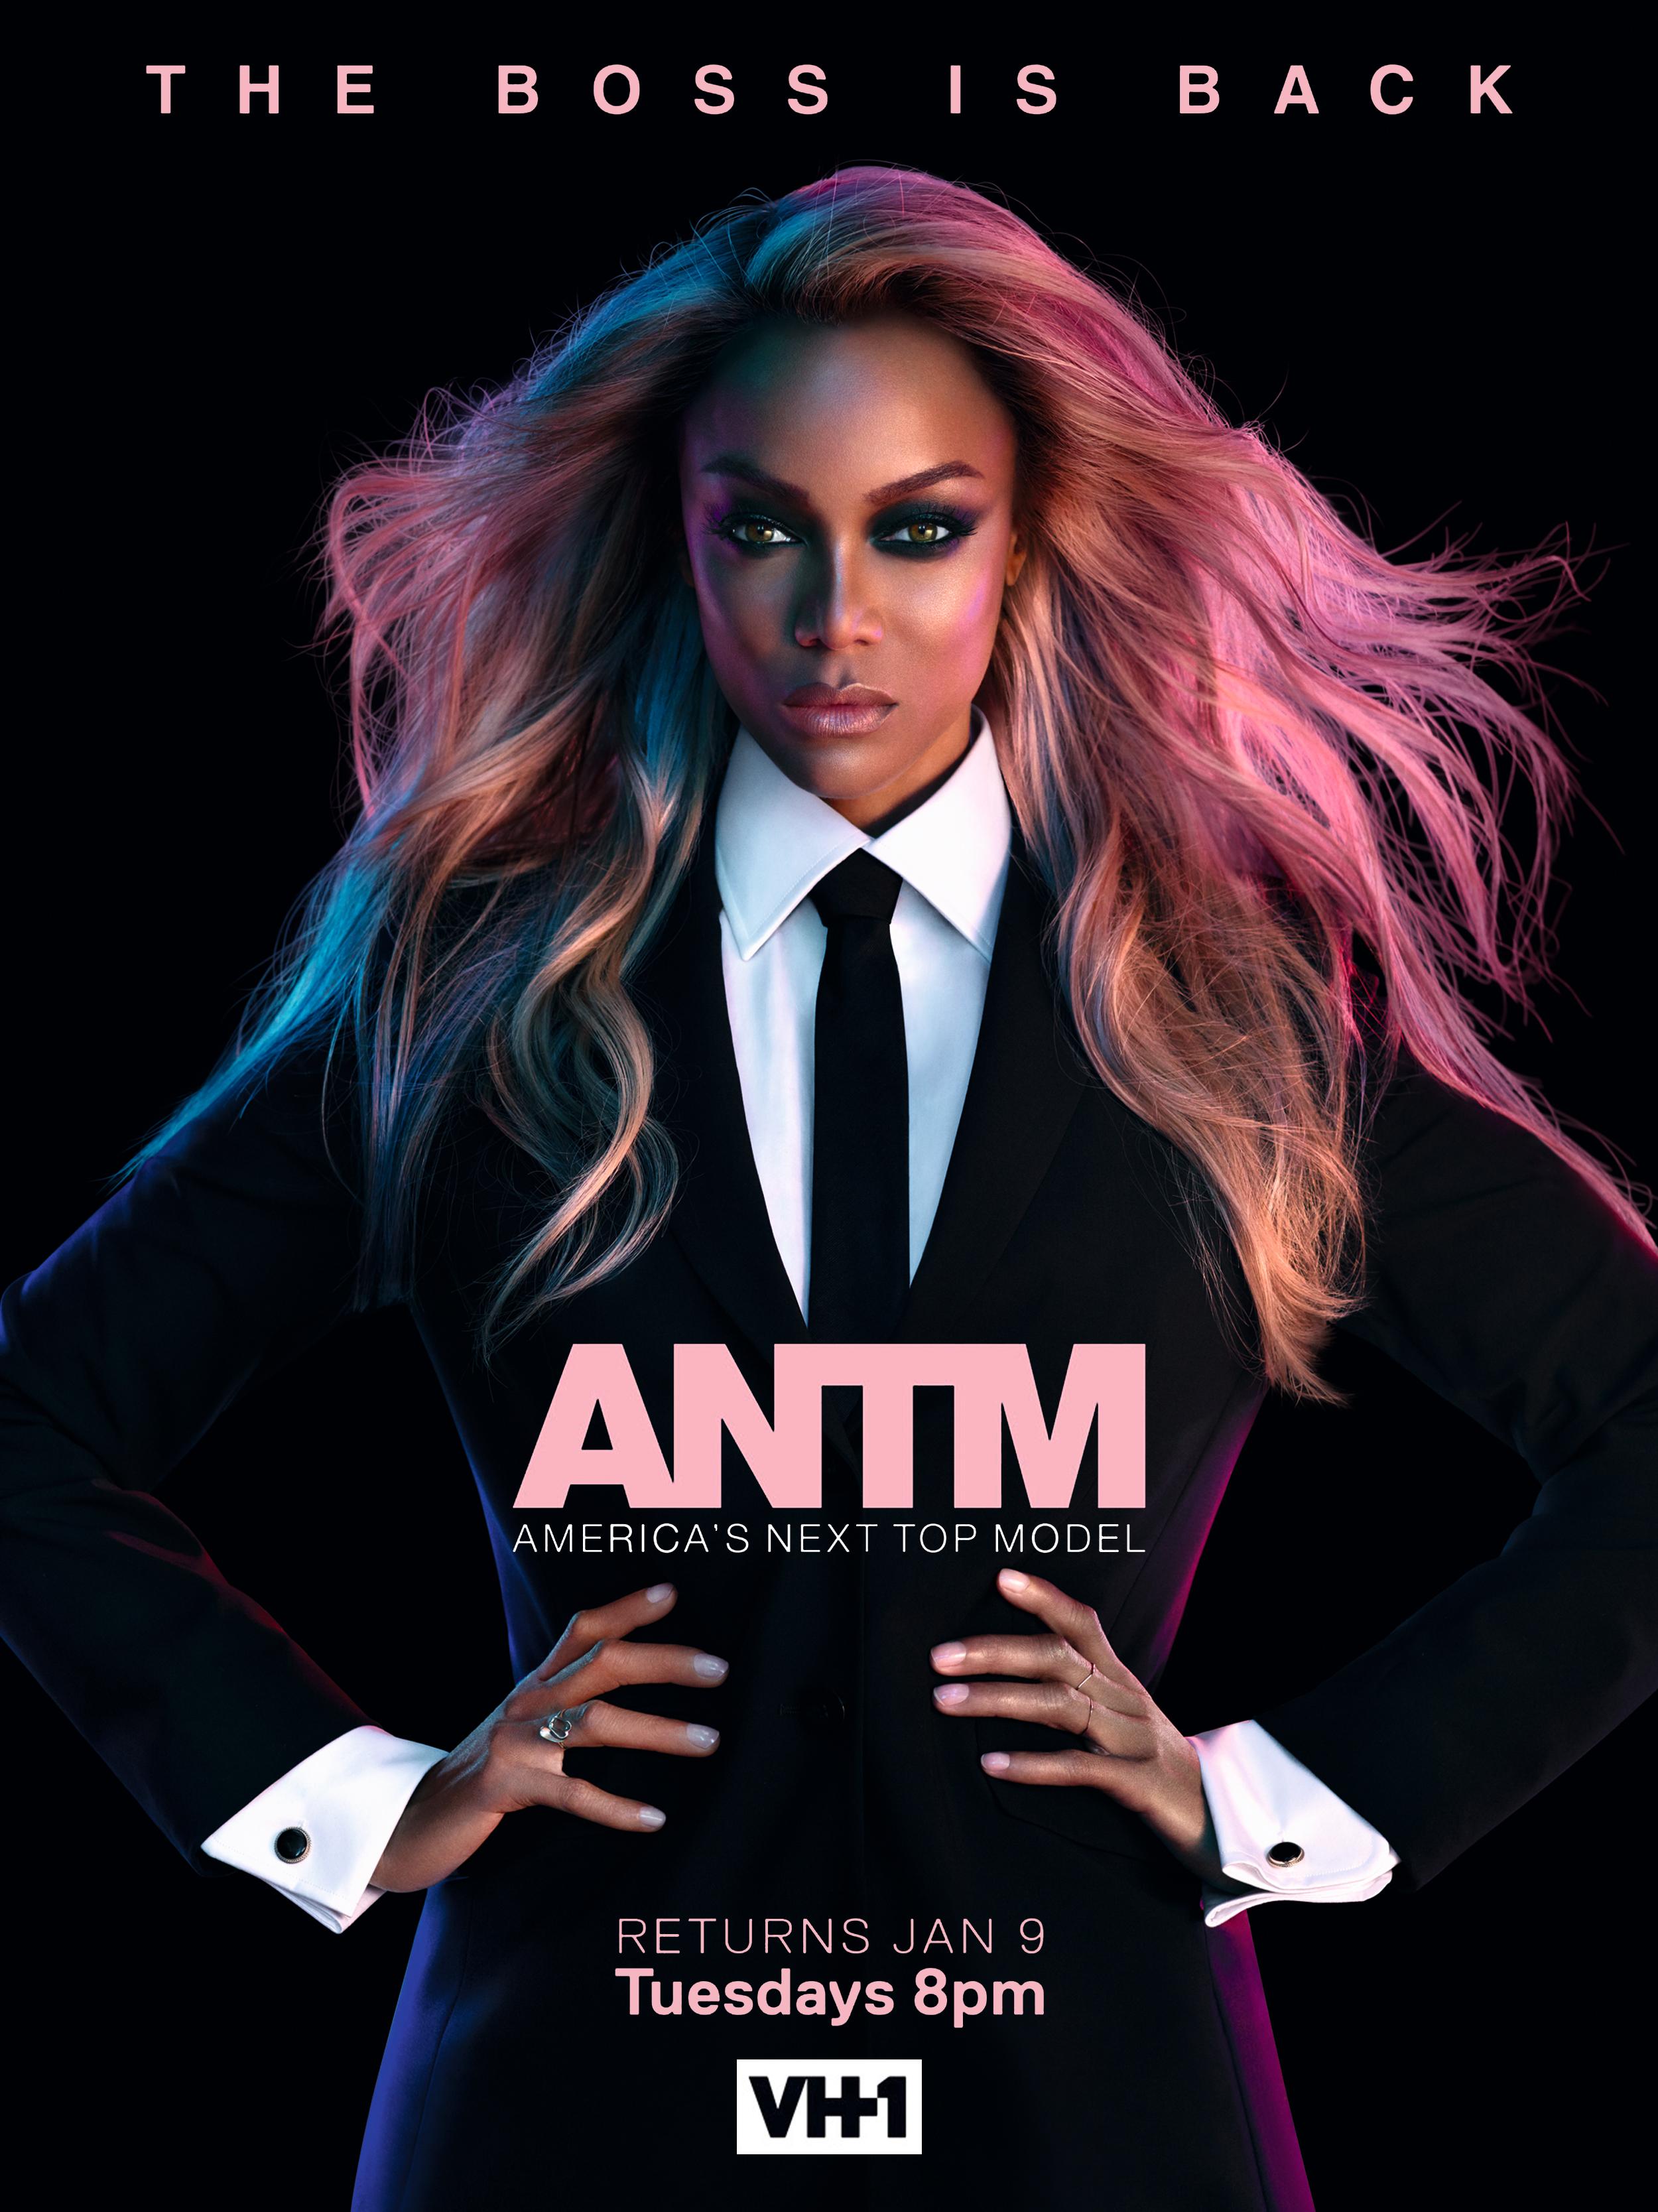 VH1_ANTM_KEY_ART_CYCLE_24_10_18_2017_0054_RETOUCHED_extended_CMYK_v2_MED.jpg